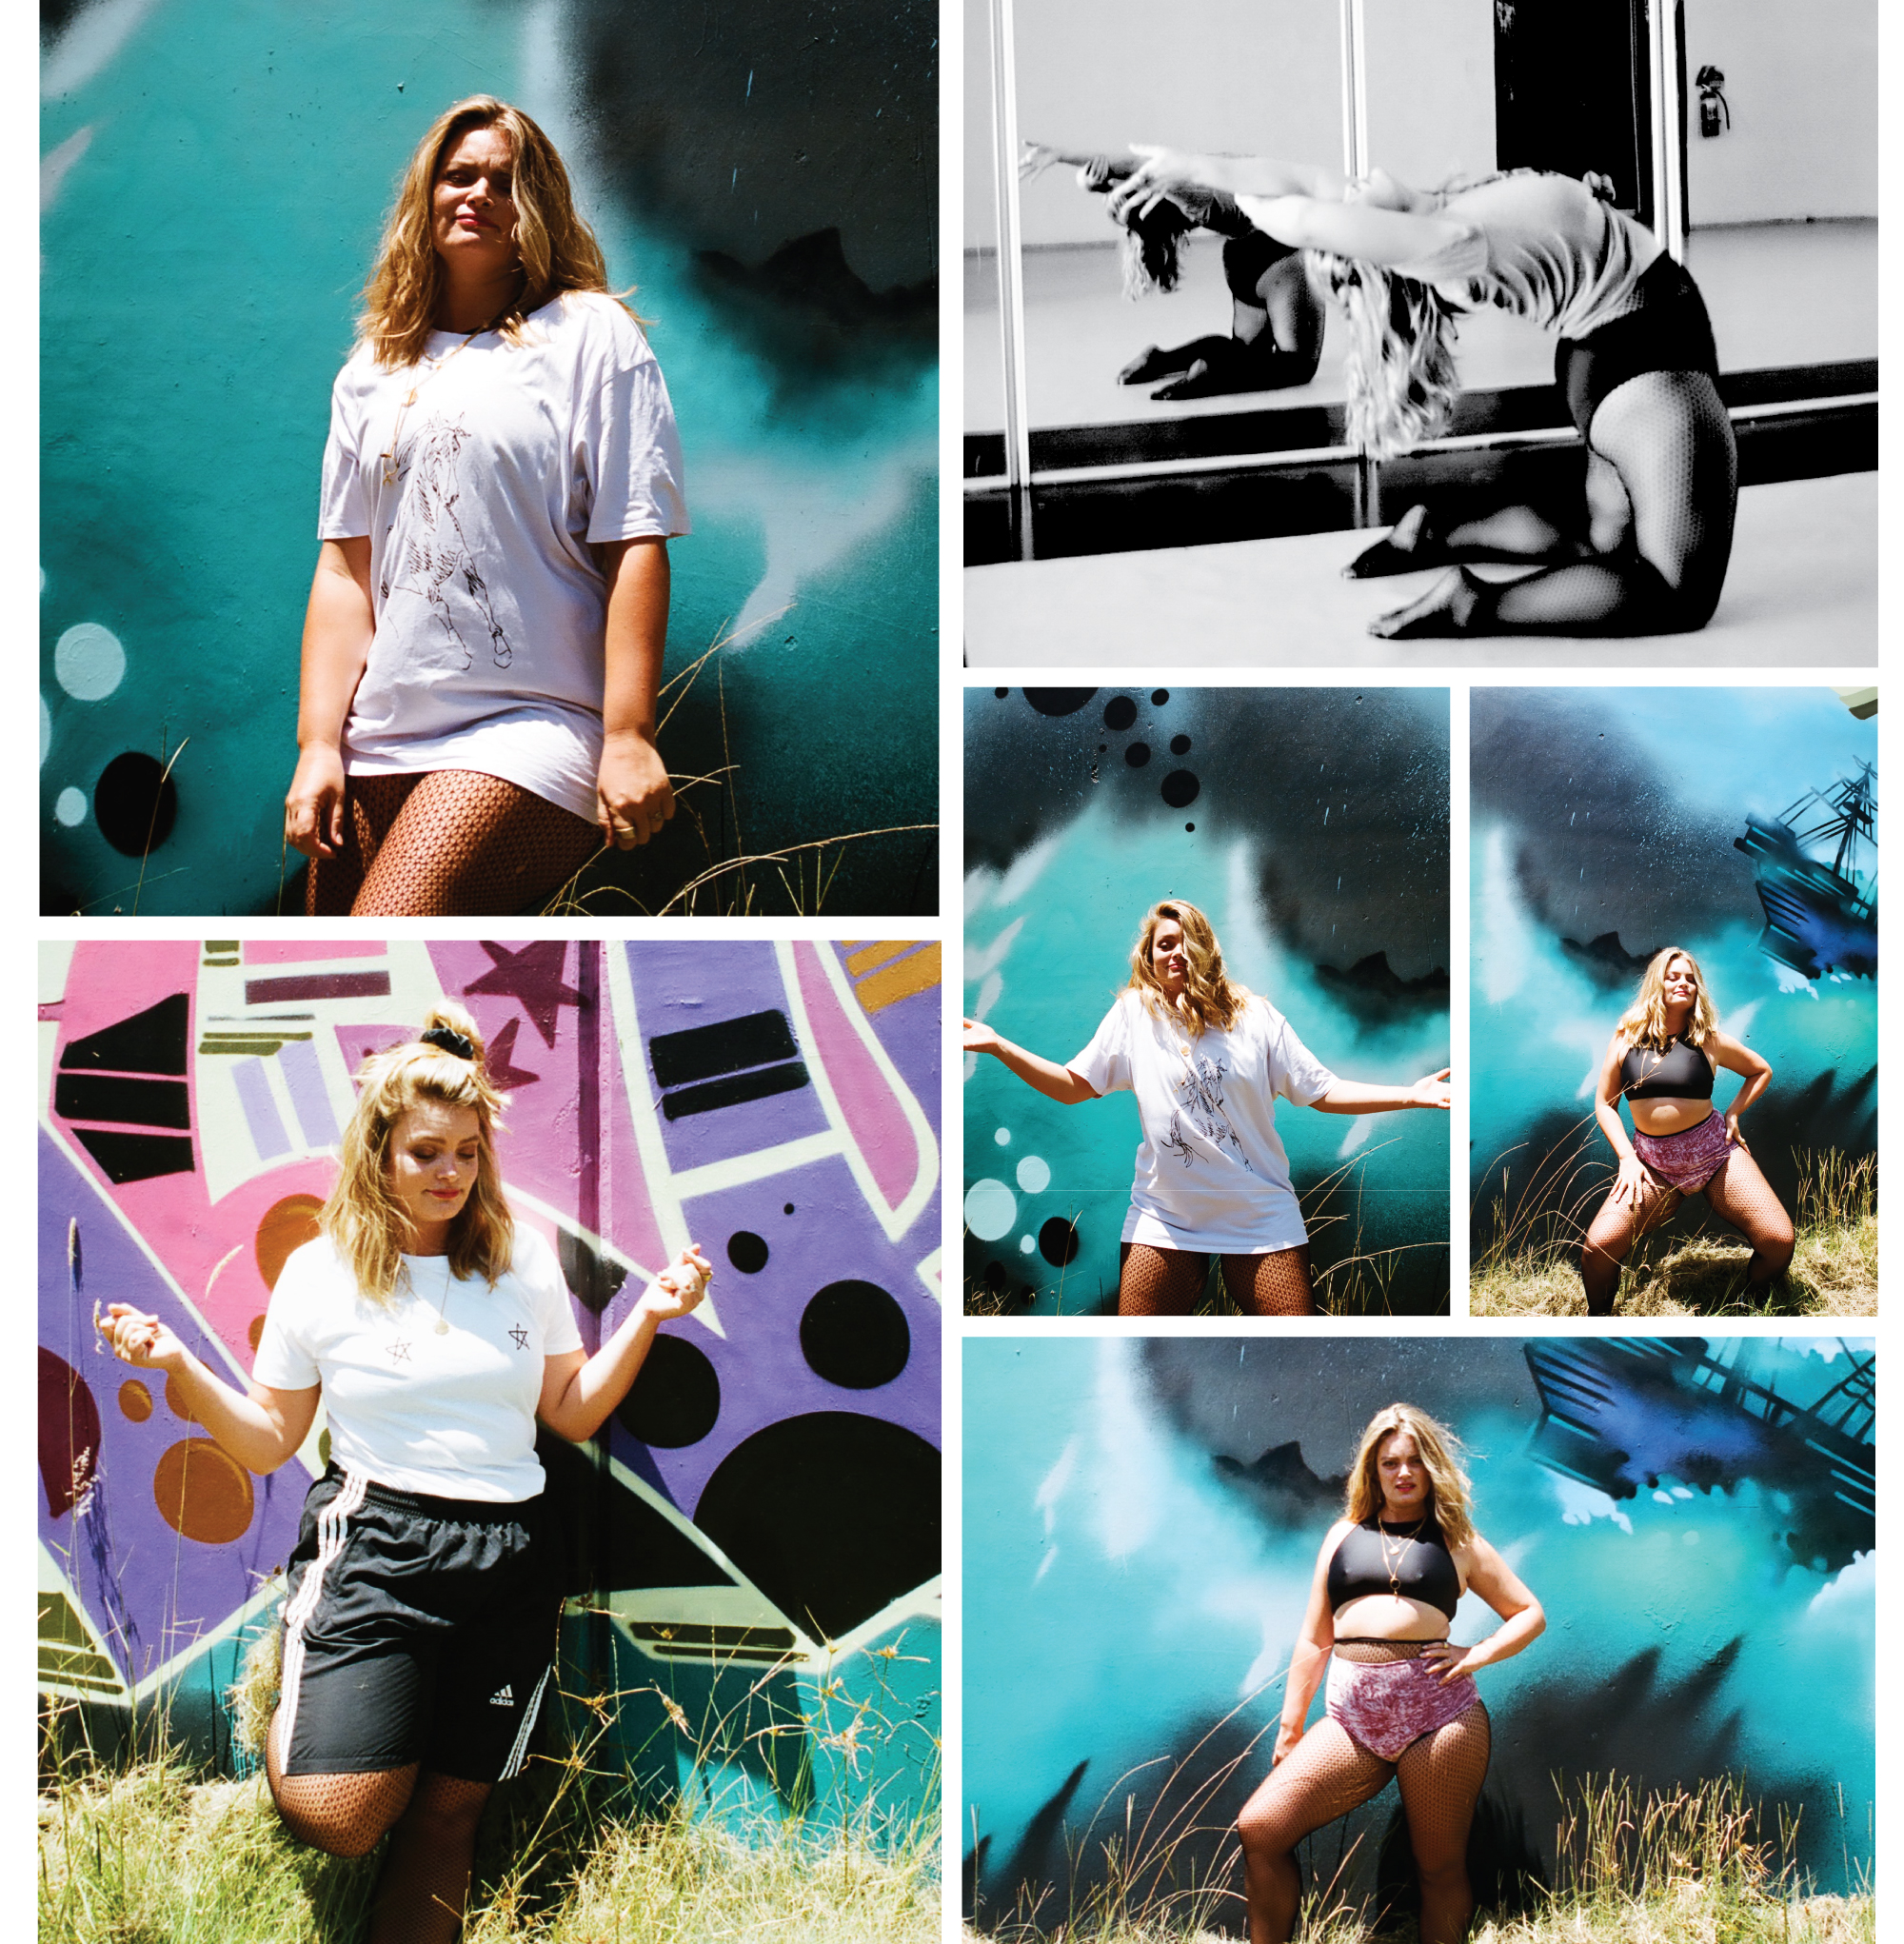 Kyla-Blacksmith-K-Dizzle-Hip-Hop-Jam-That's-My-Jam-Byron-Bay-by-Liar-the-Label-grafitti-lilac-horse-tee.jpg